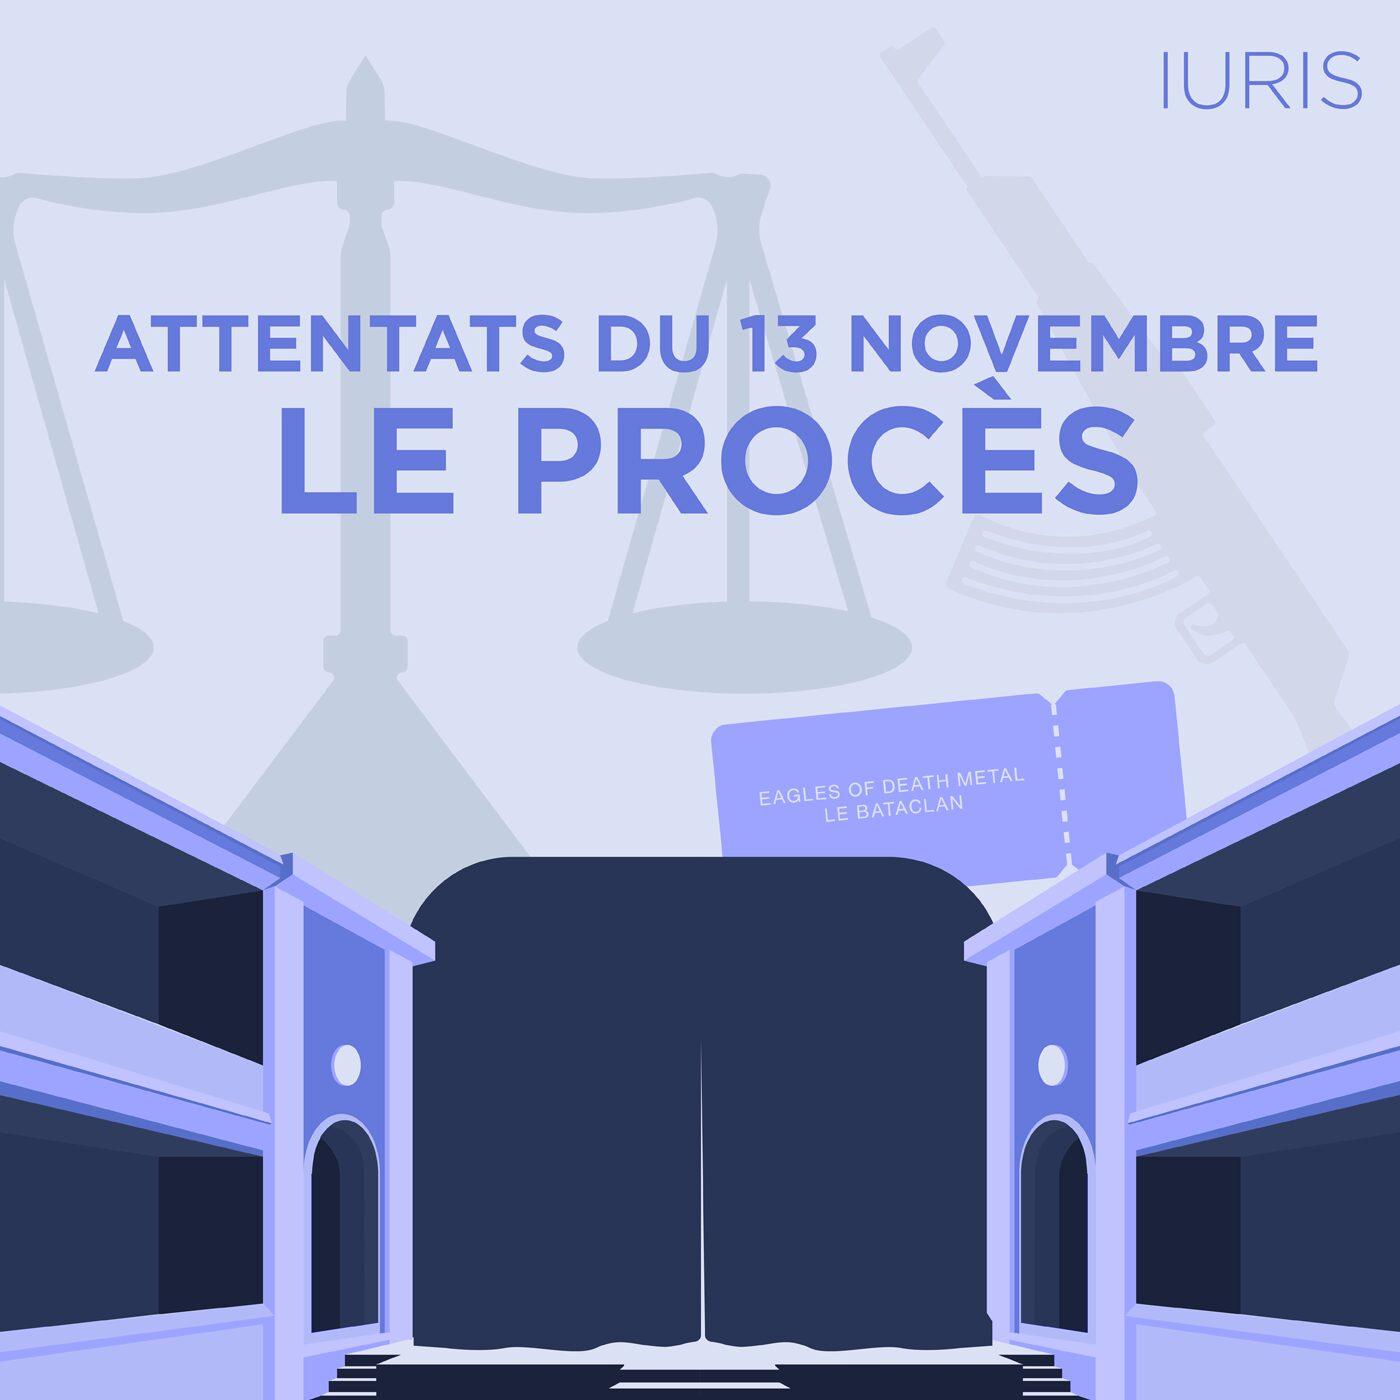 IURIS Attentats du 13 Novembre : Le Procès